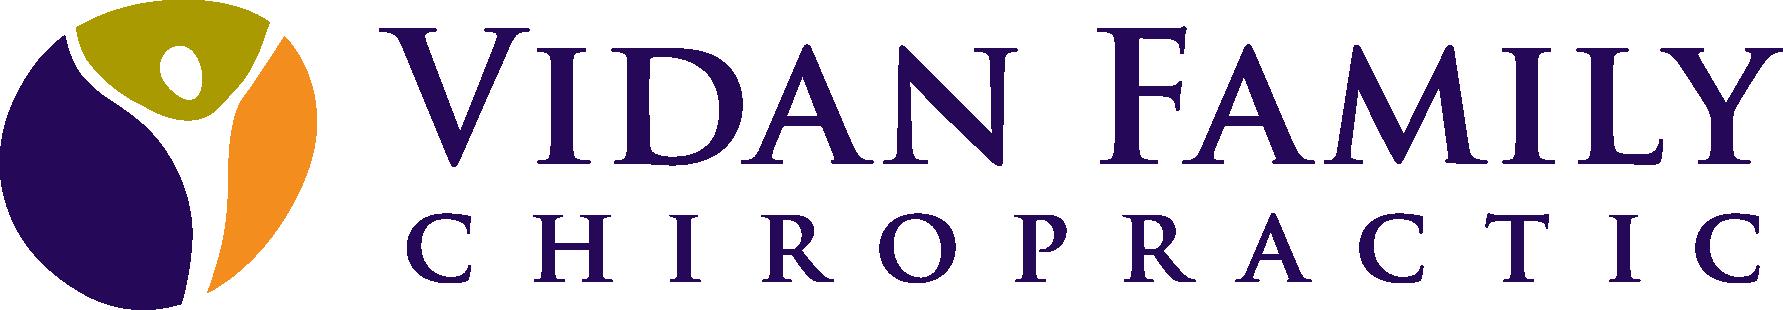 Pierce Chiropractic logo